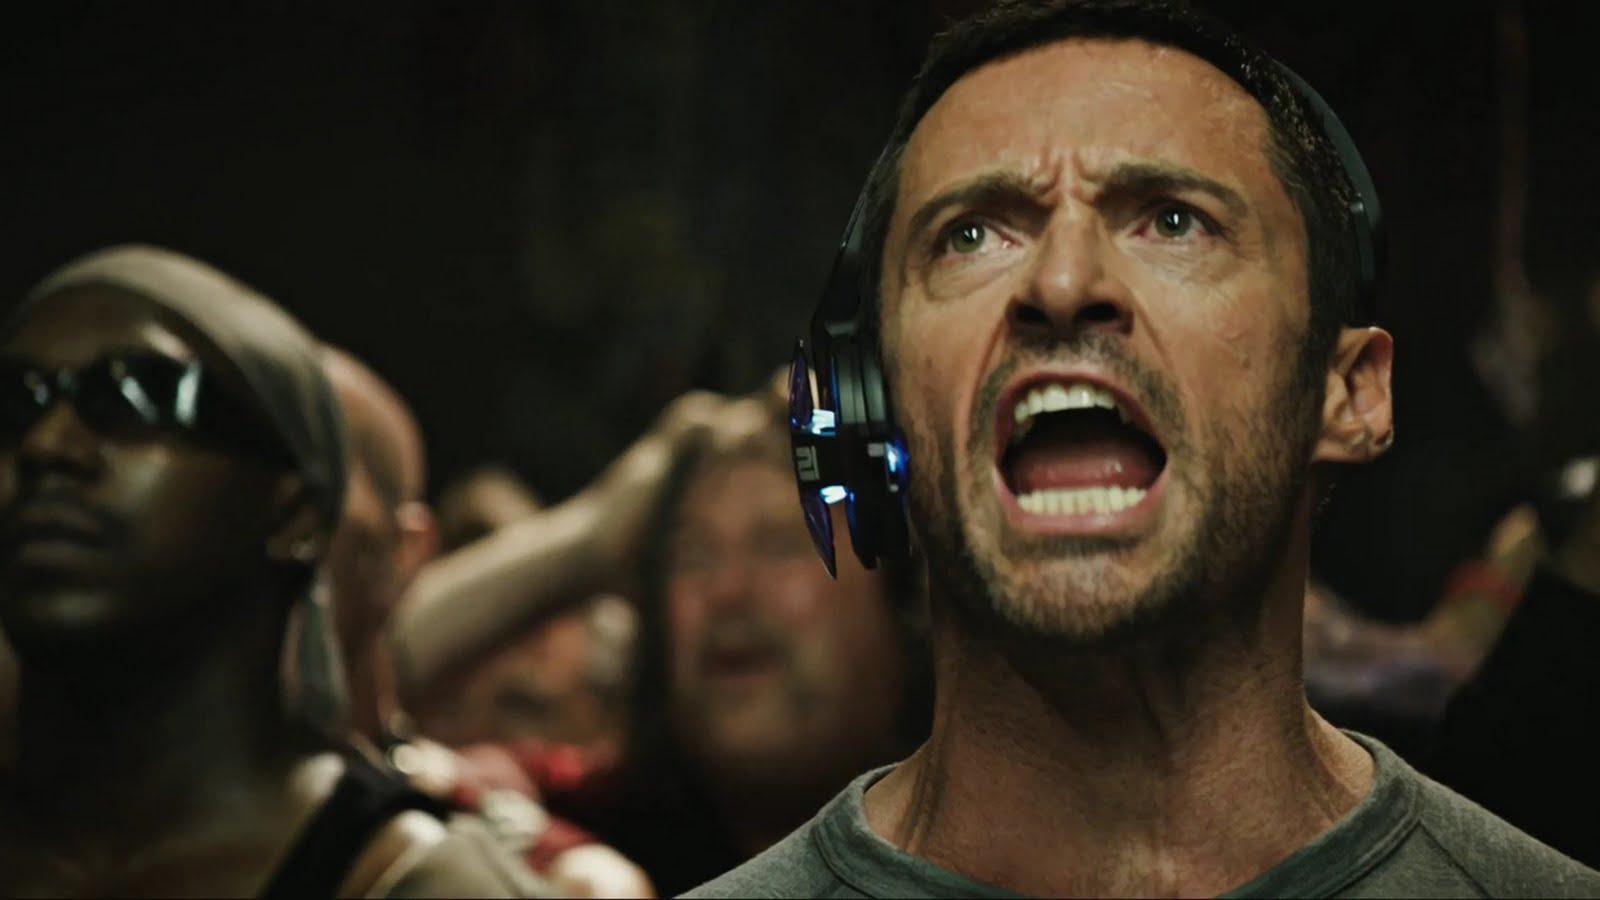 Movies: Real Steel (2011)